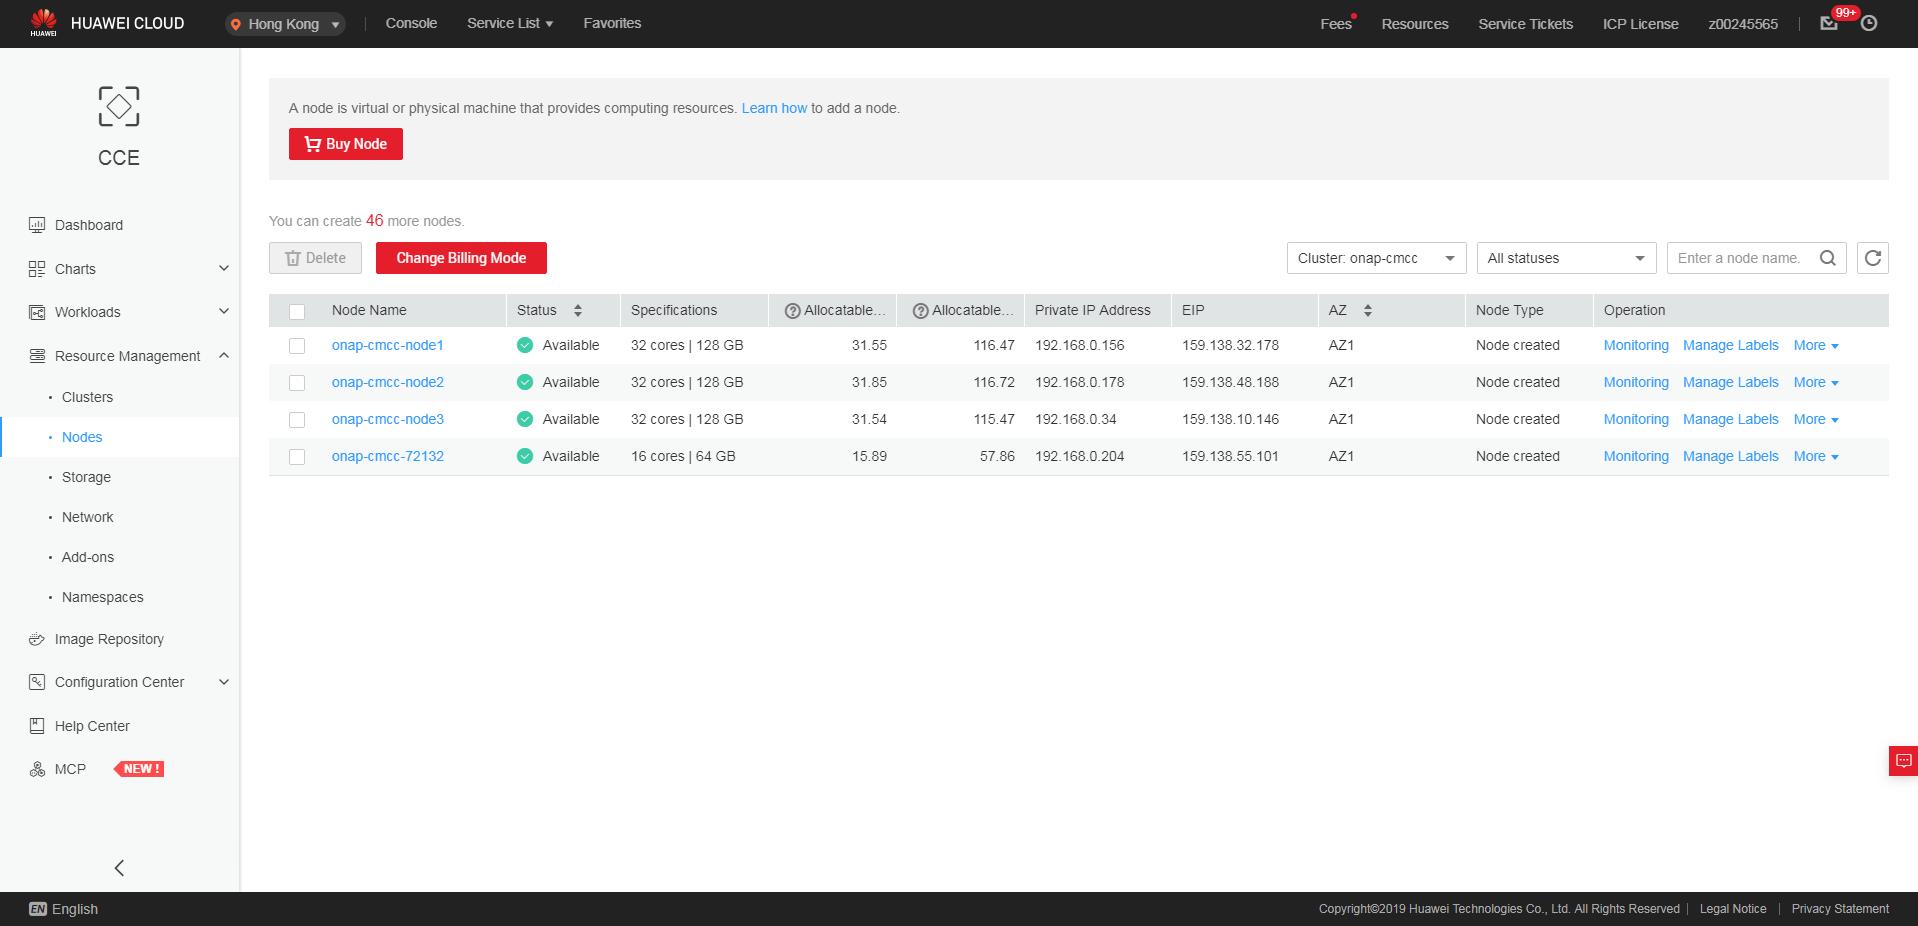 ONAP on Kubernetes on Huawei Cloud - Developer Wiki - Confluence